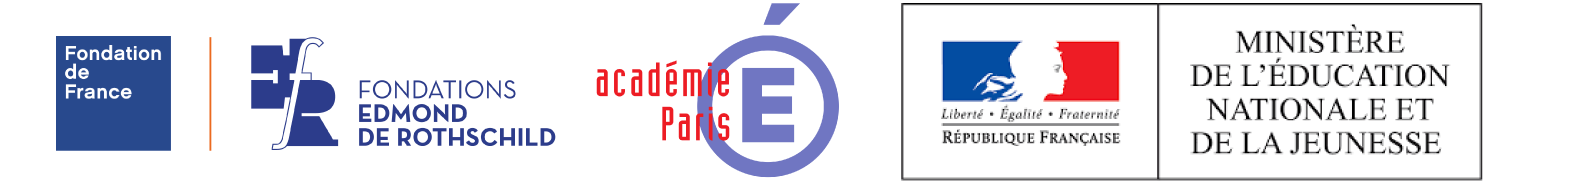 banniere-logos-philanthropie